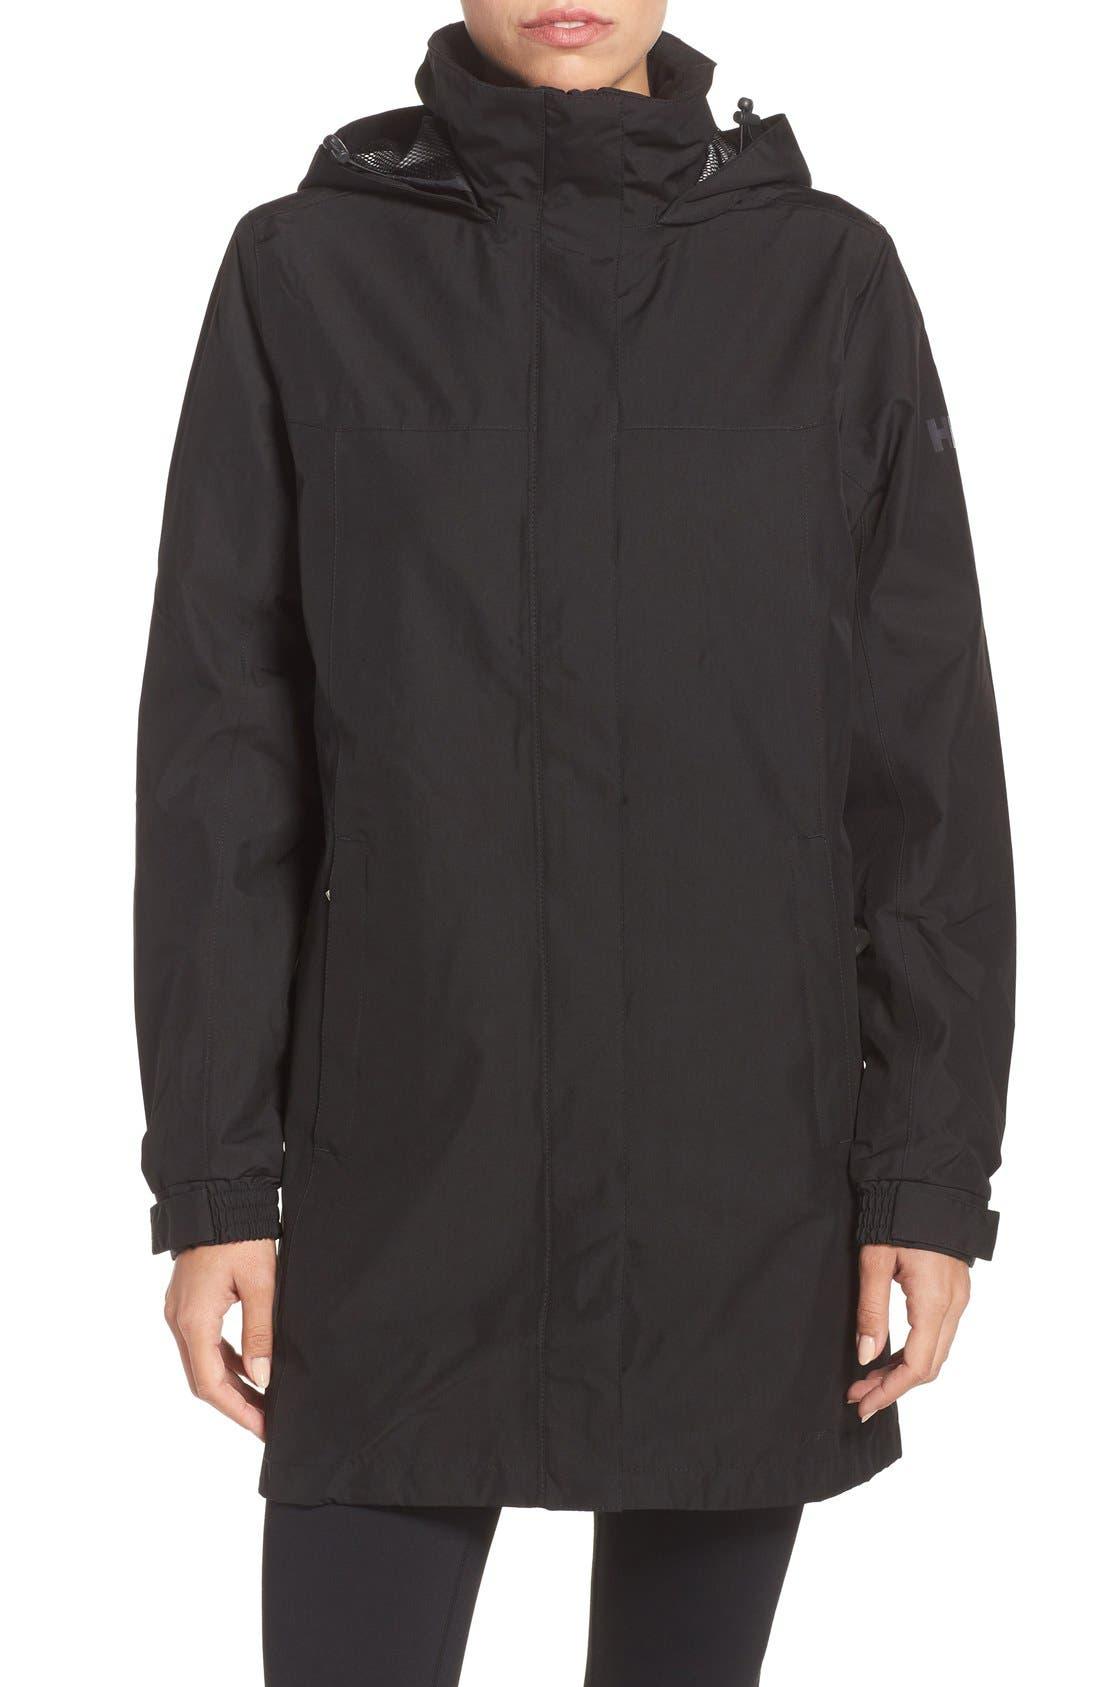 HELLY HANSEN, 'Aden' Helly Tech<sup>®</sup> Raincoat, Main thumbnail 1, color, BLACK